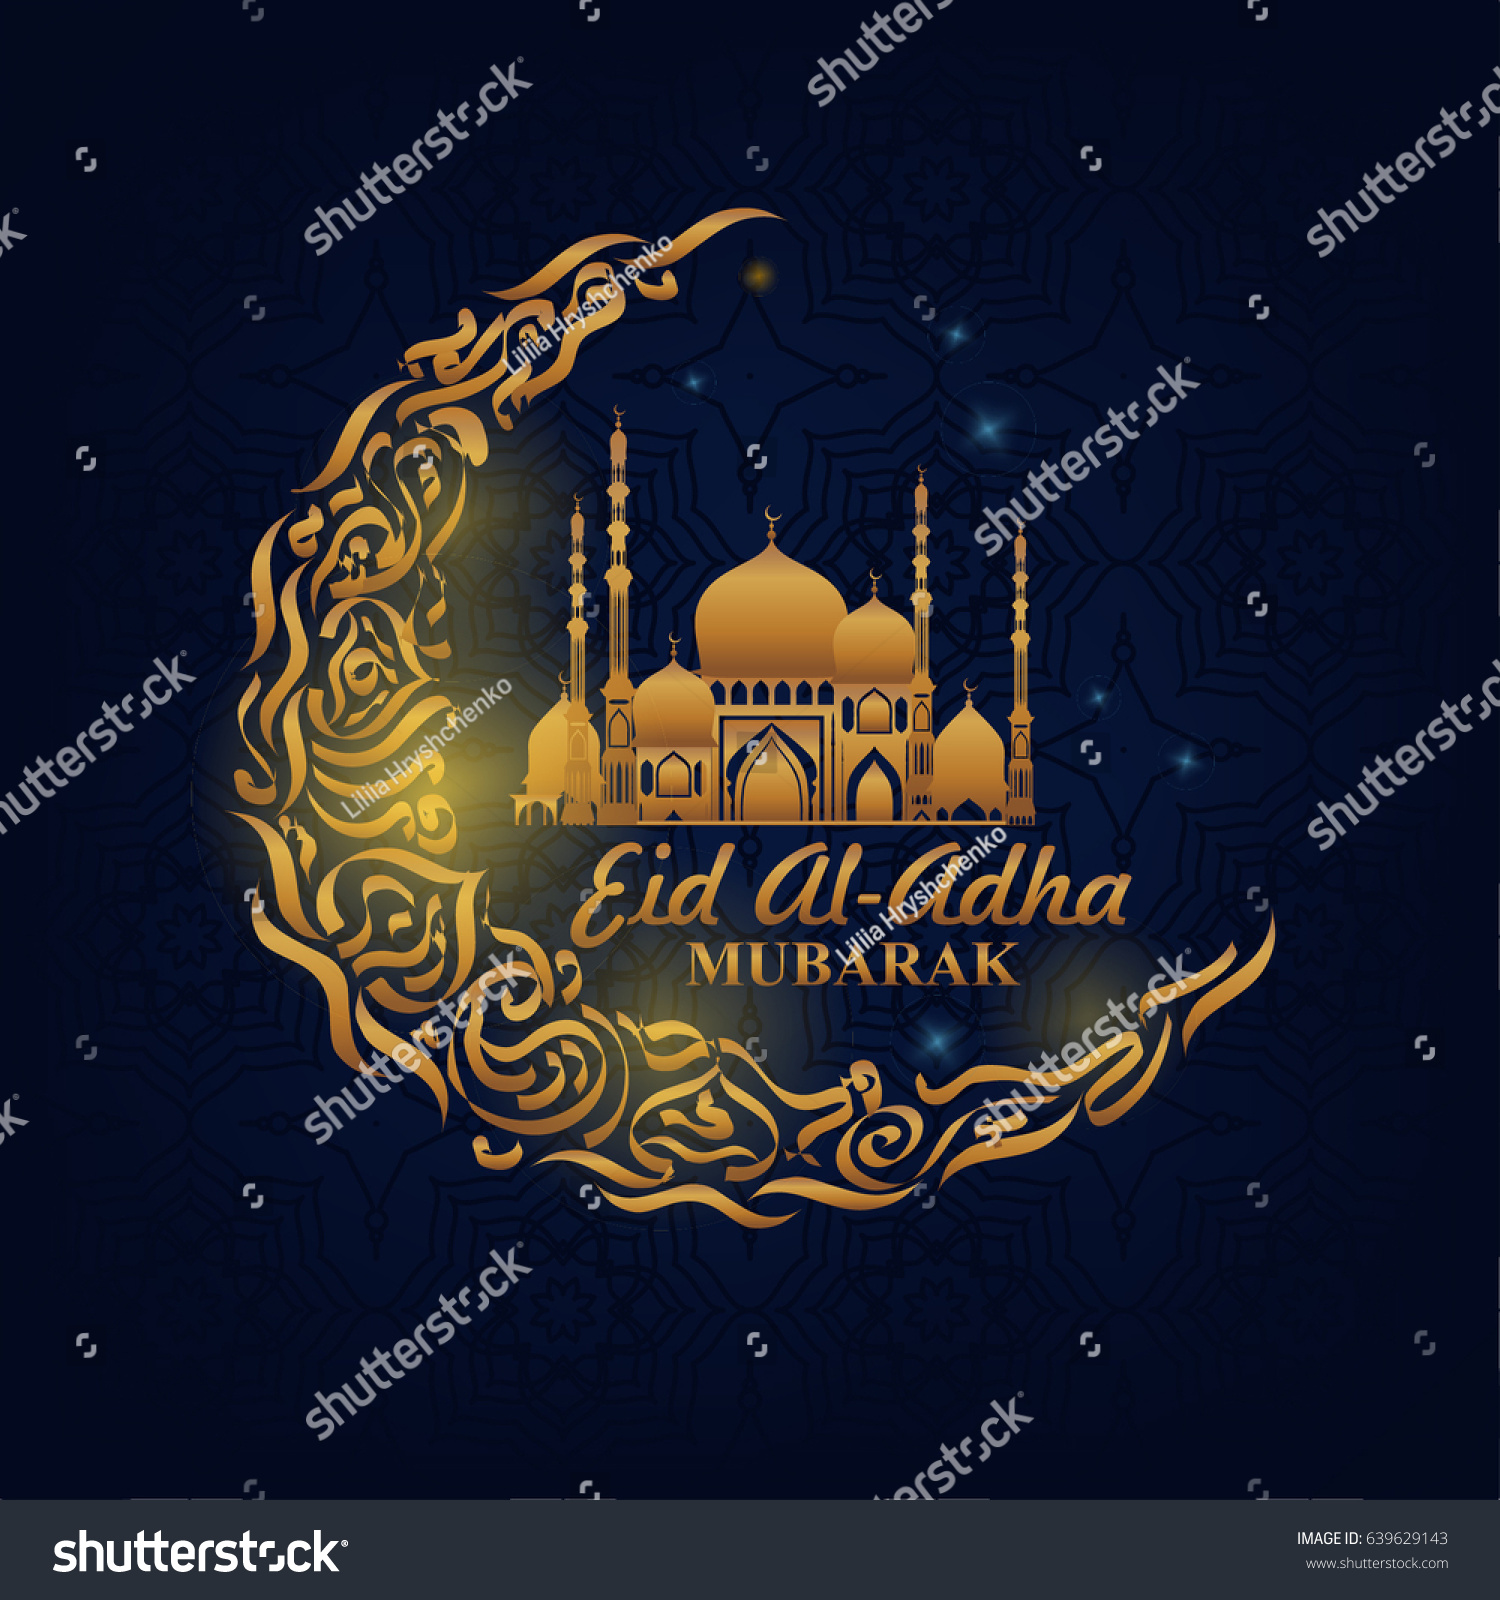 Eid mubarak ramadan greeting card mosque stock vector royalty free ramadan greeting card mosque vector illustration islamic background holy month m4hsunfo